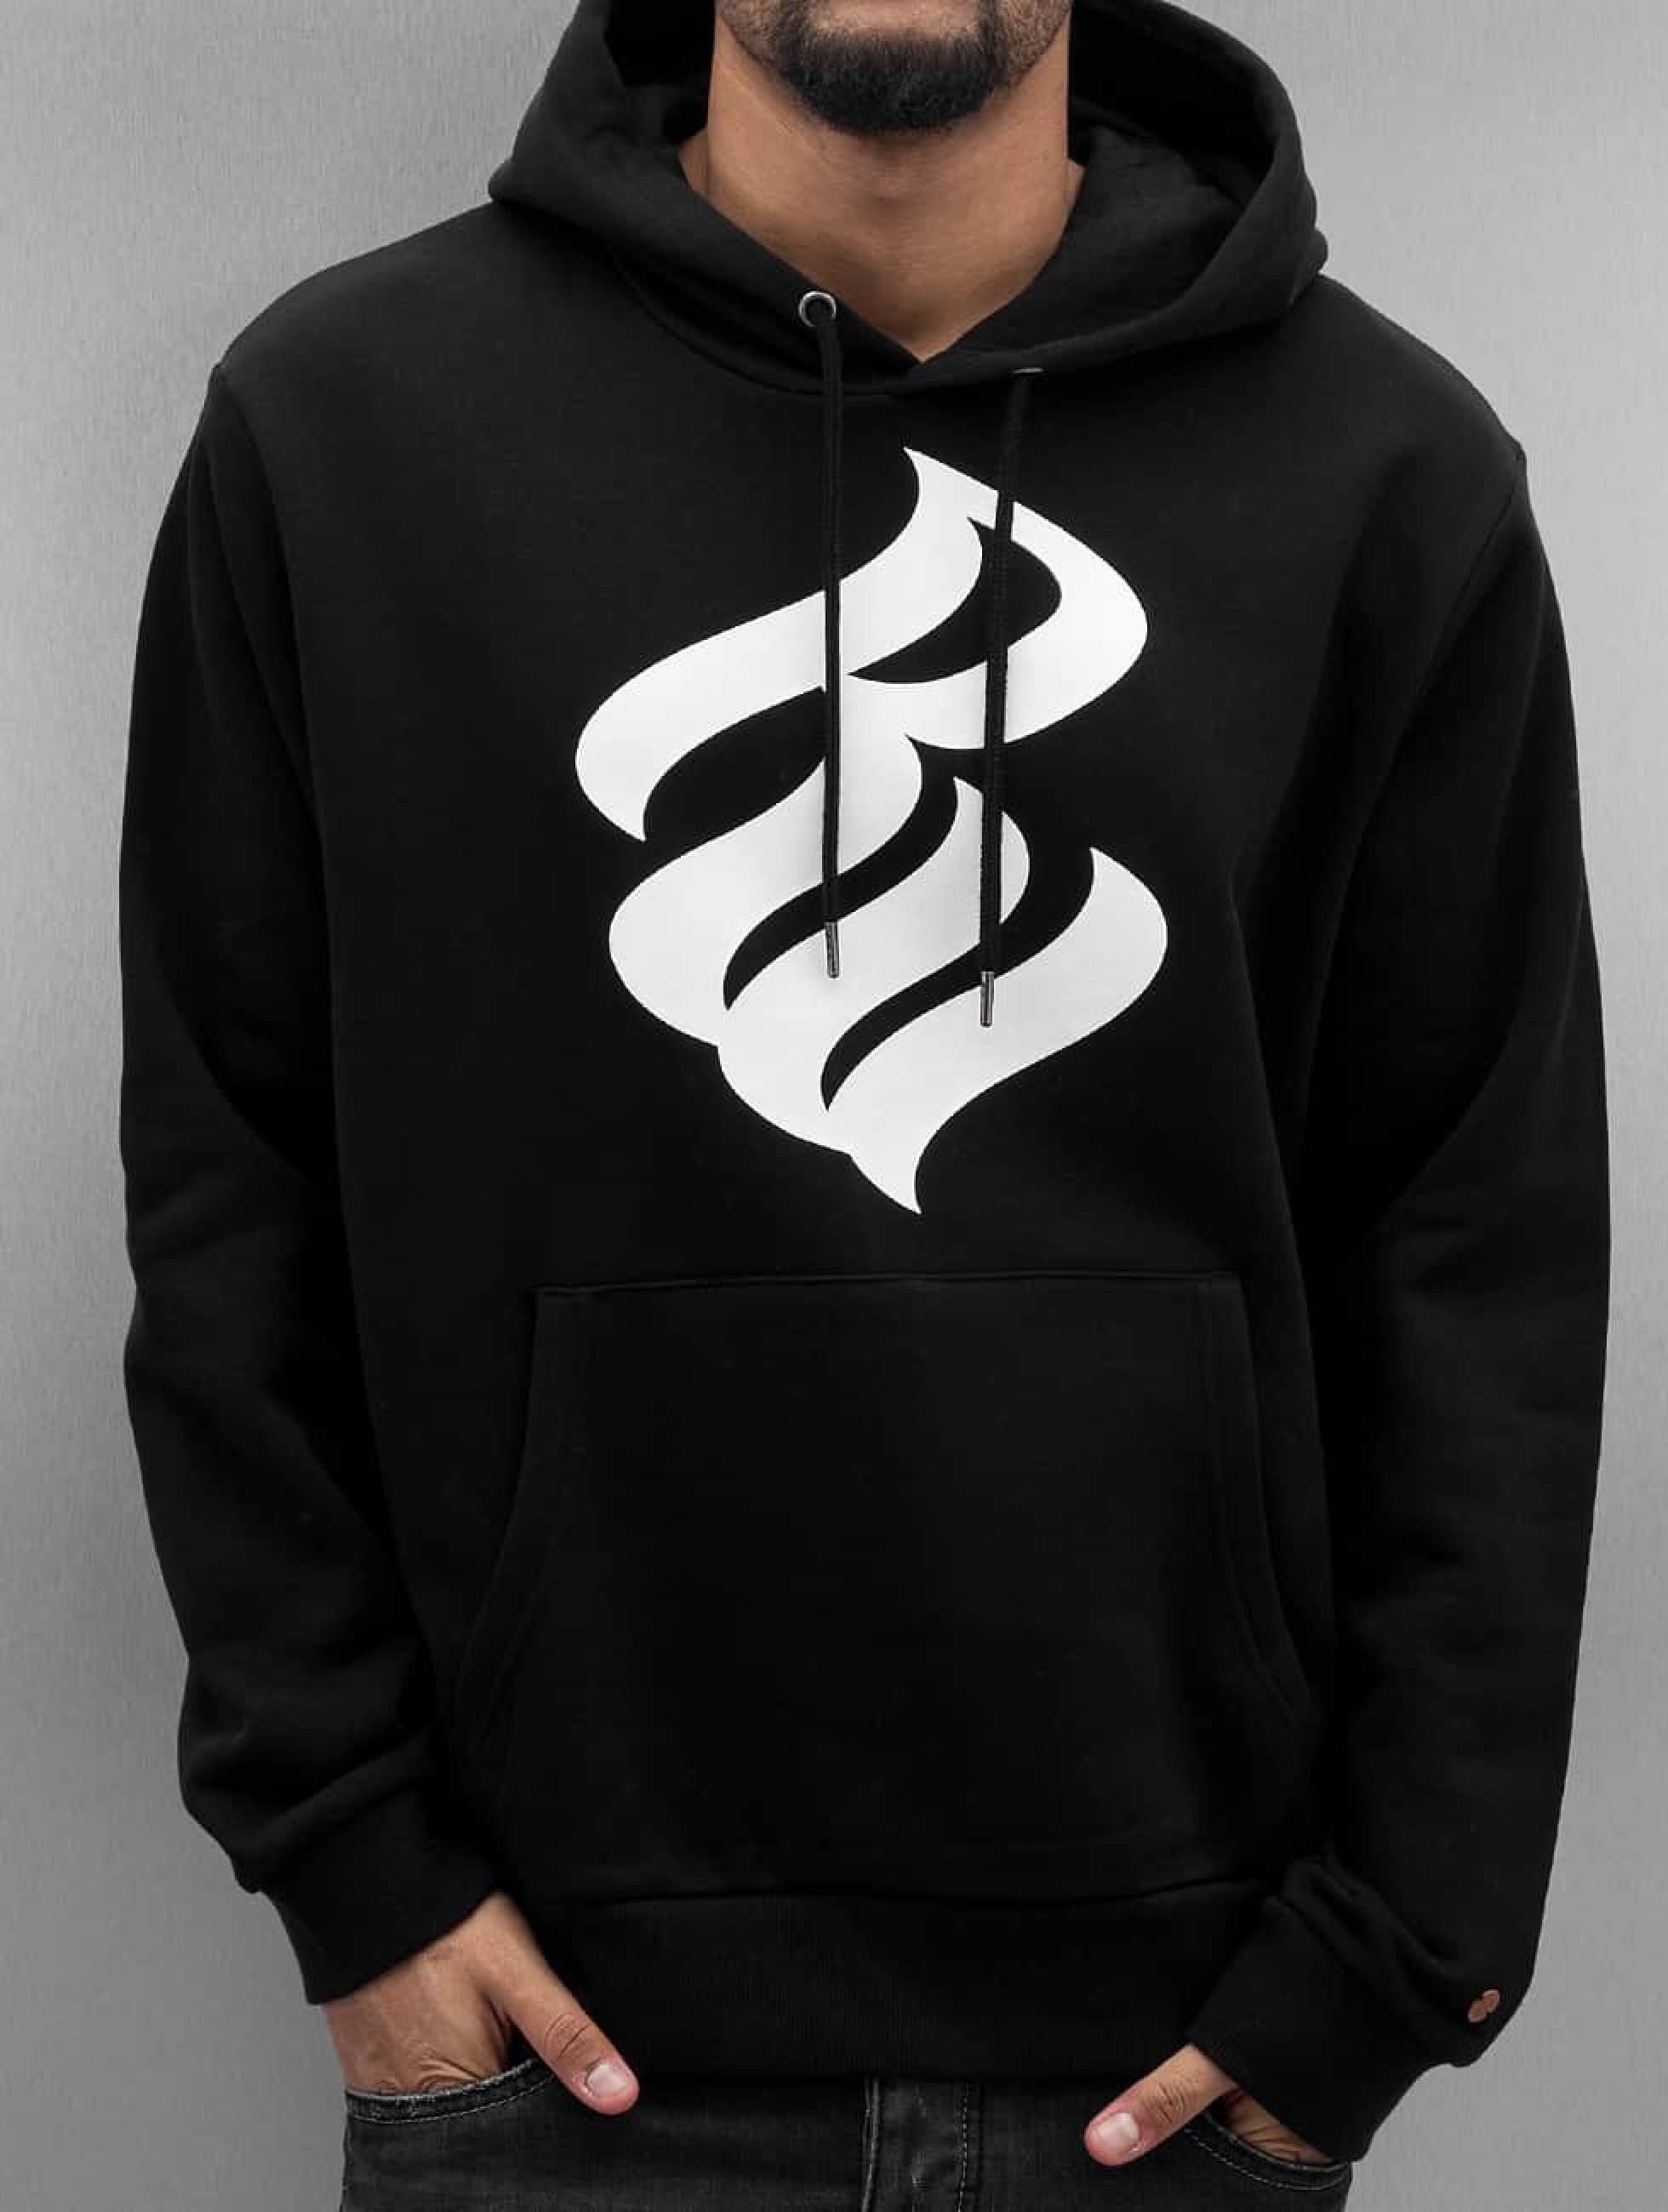 Rocawear / Hoodie Fleece in black S